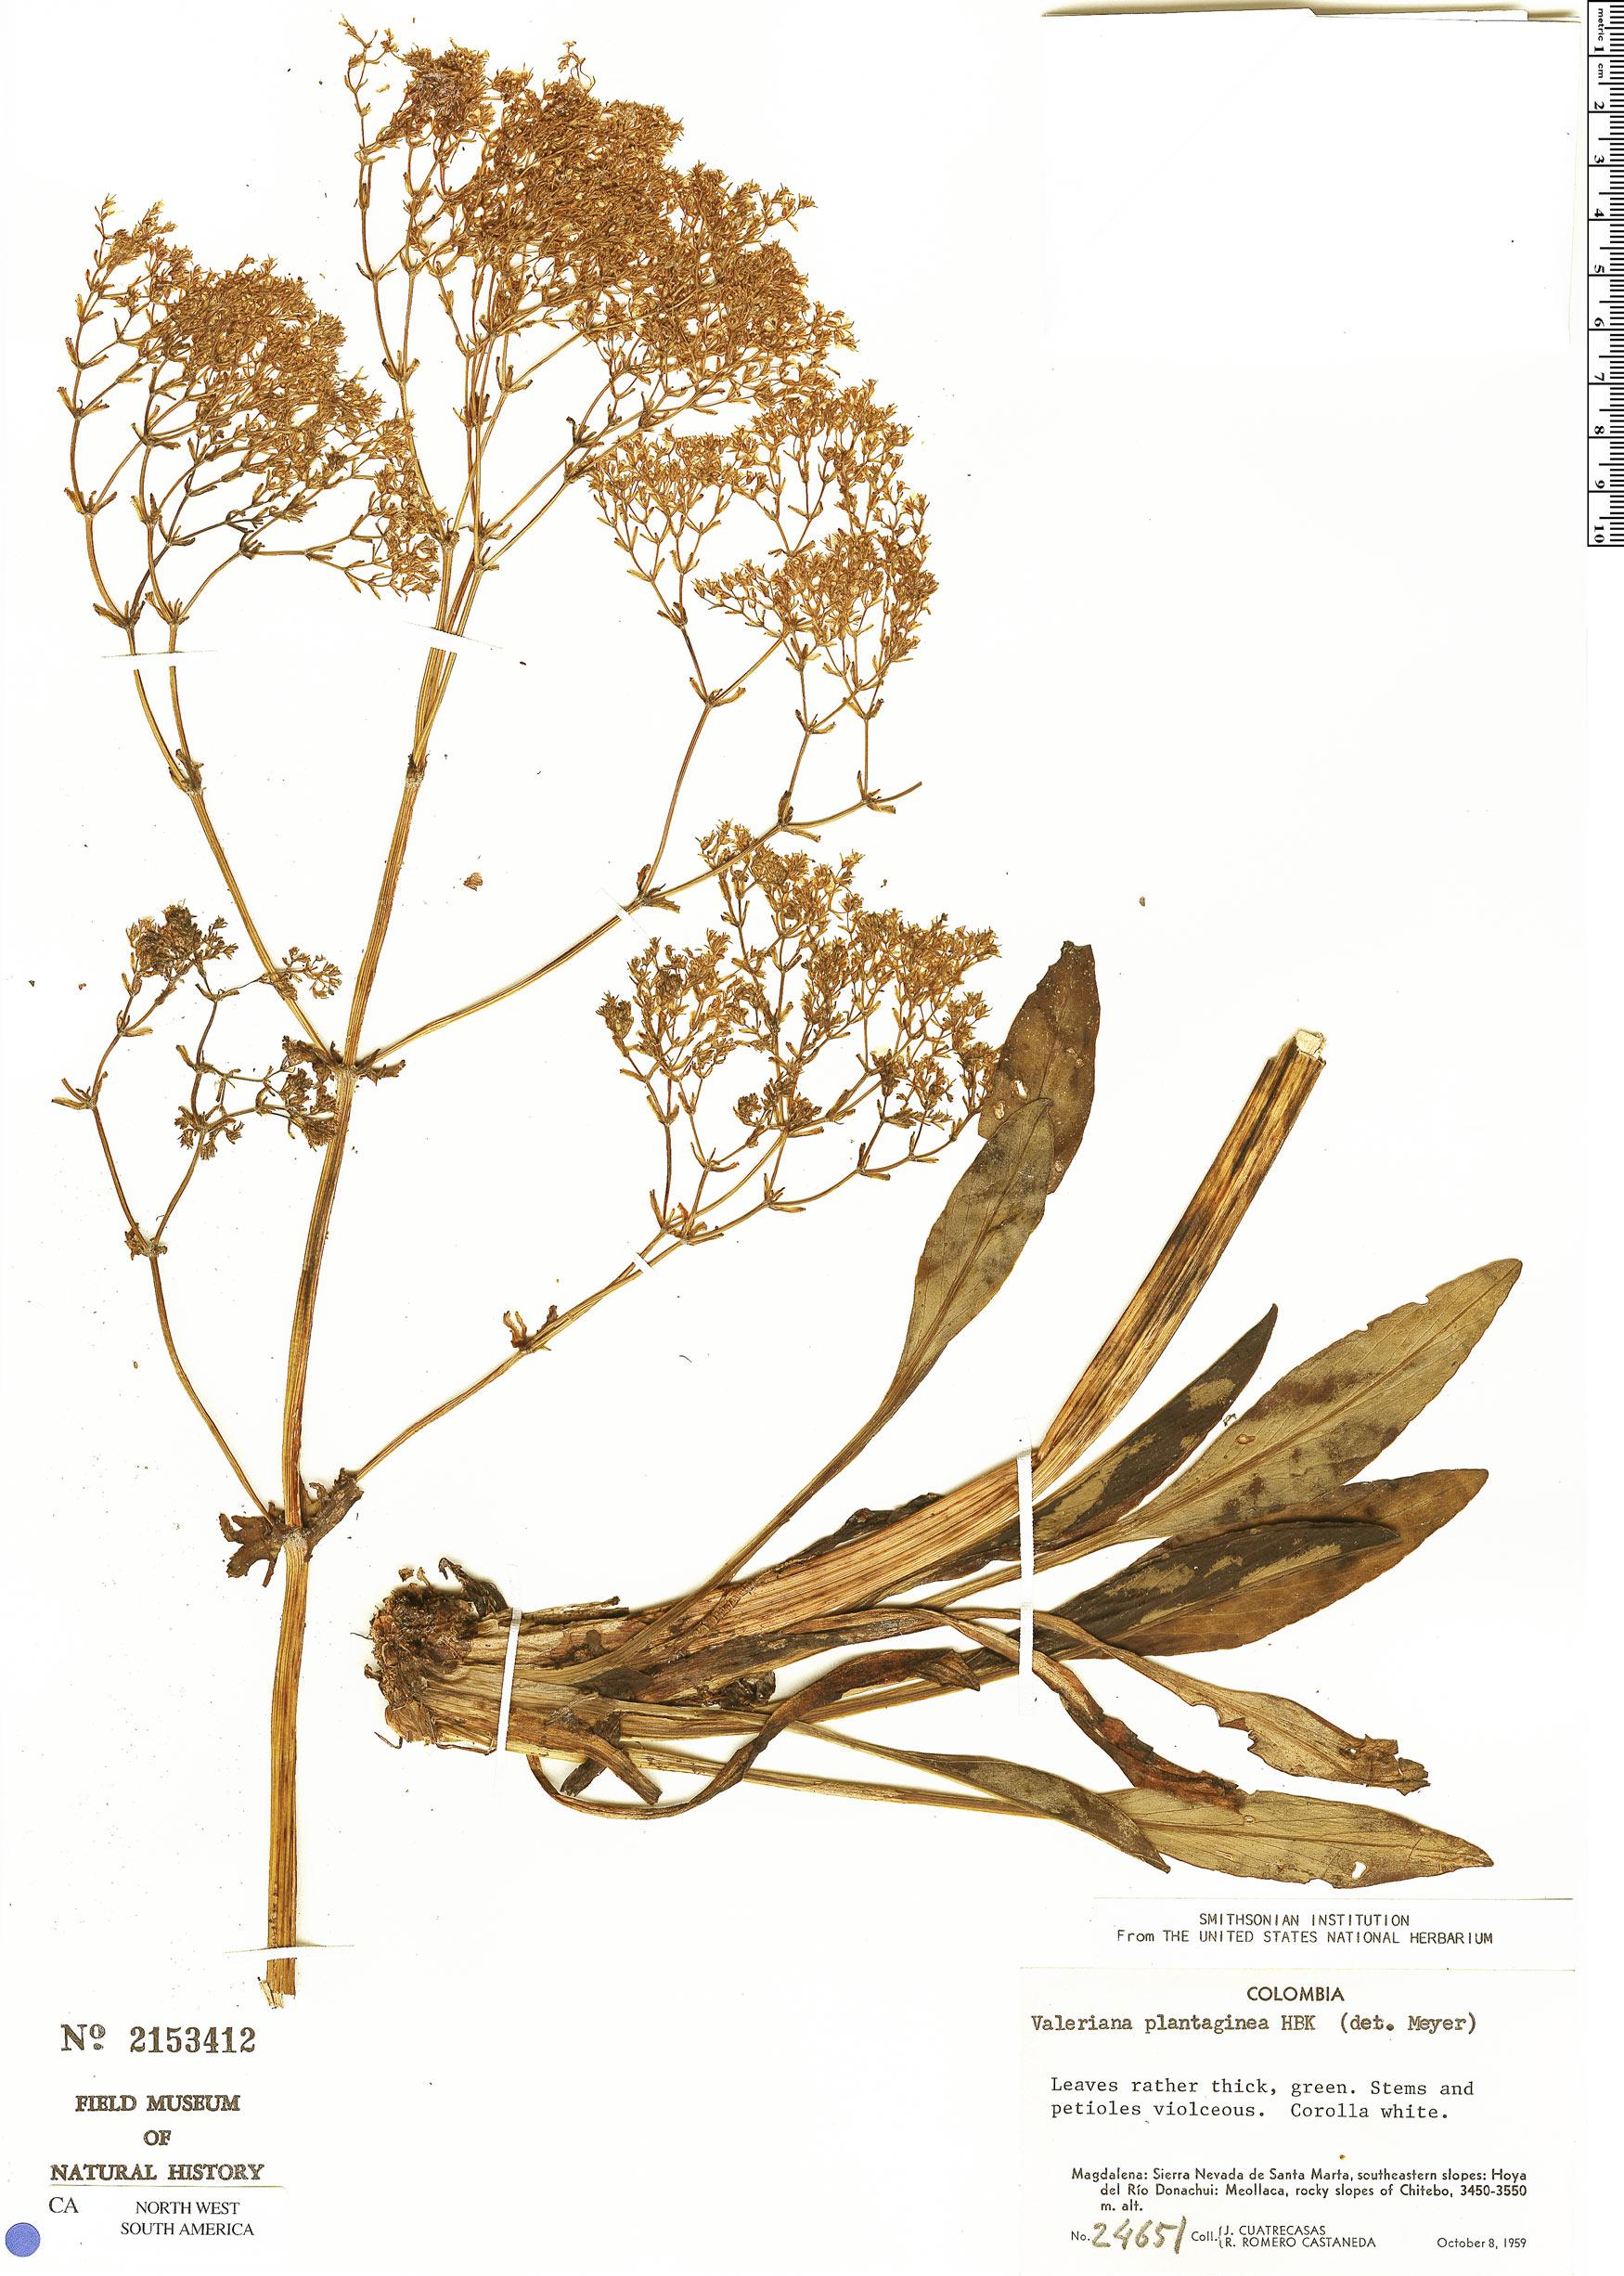 Specimen: Valeriana plantaginea